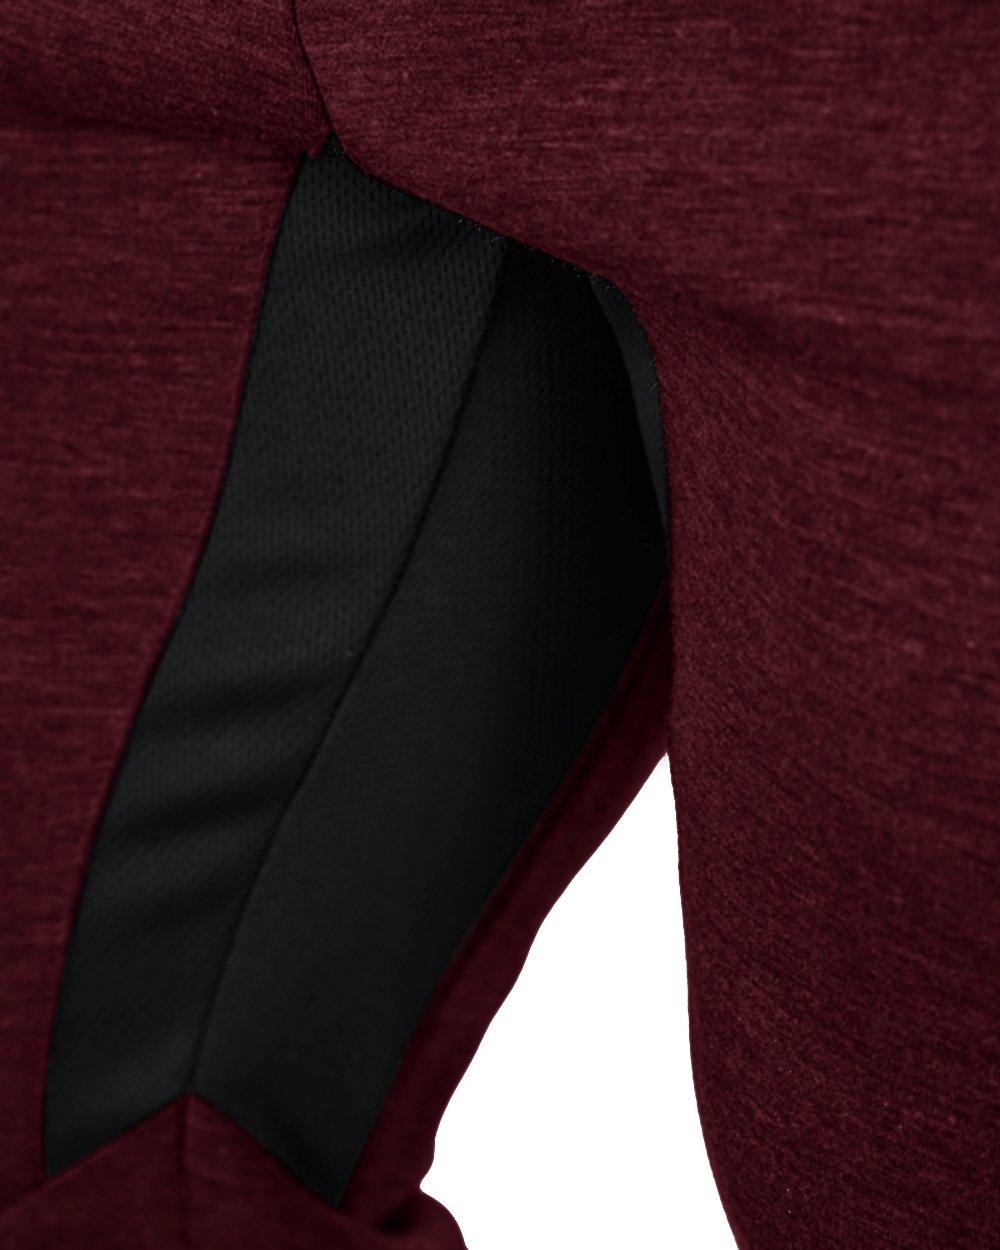 EKLENTSON Uomo Tre Quarti Pantaloni Capri 3//4/Allenamento Jogger Pantaloni Corti con Cerniera